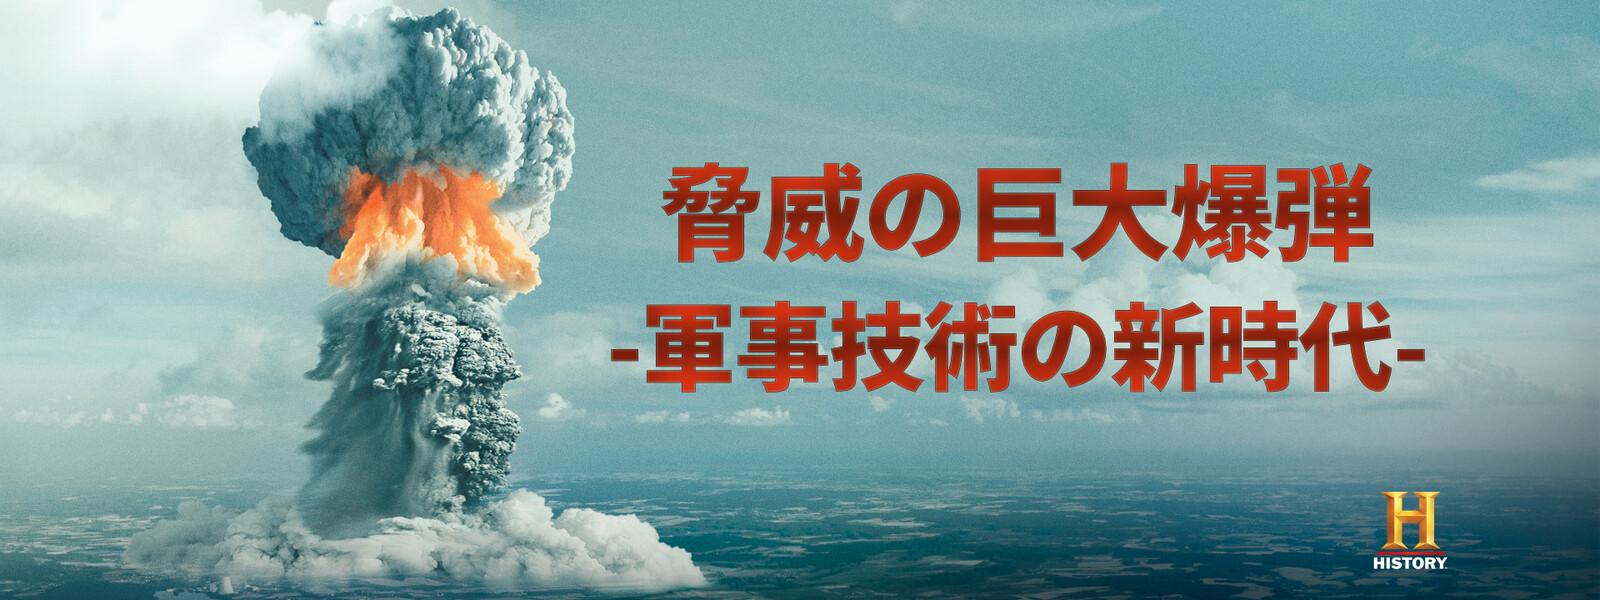 脅威の巨大爆弾 -軍事技術の新時代- 動画